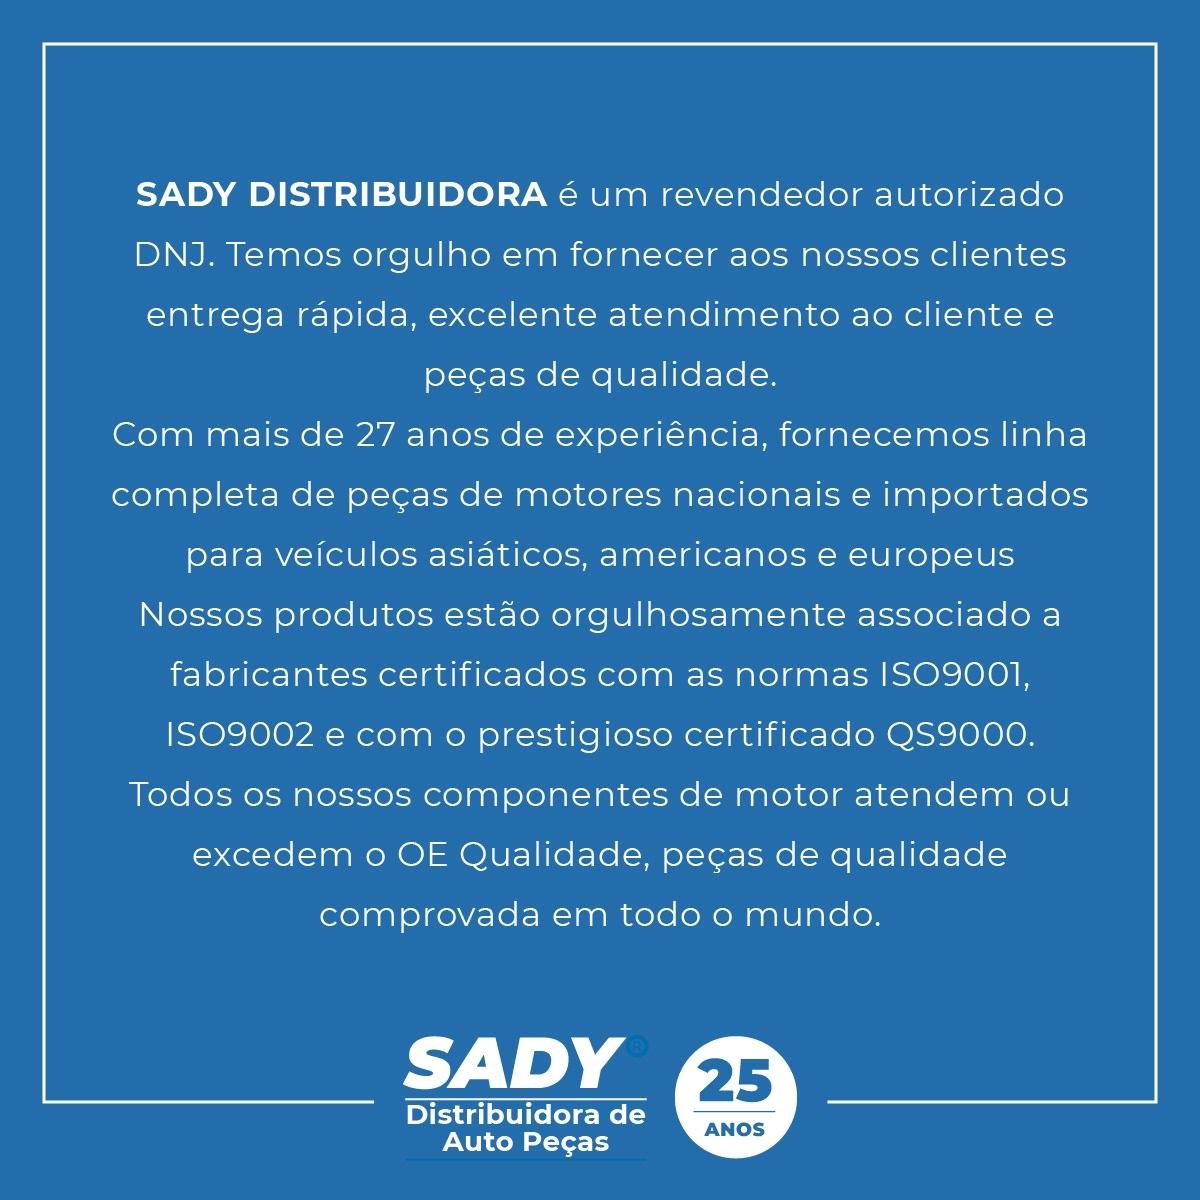 BOMBA DE OLEO DO MOTOR NISSAN 2.0/2.5 EMP H20K